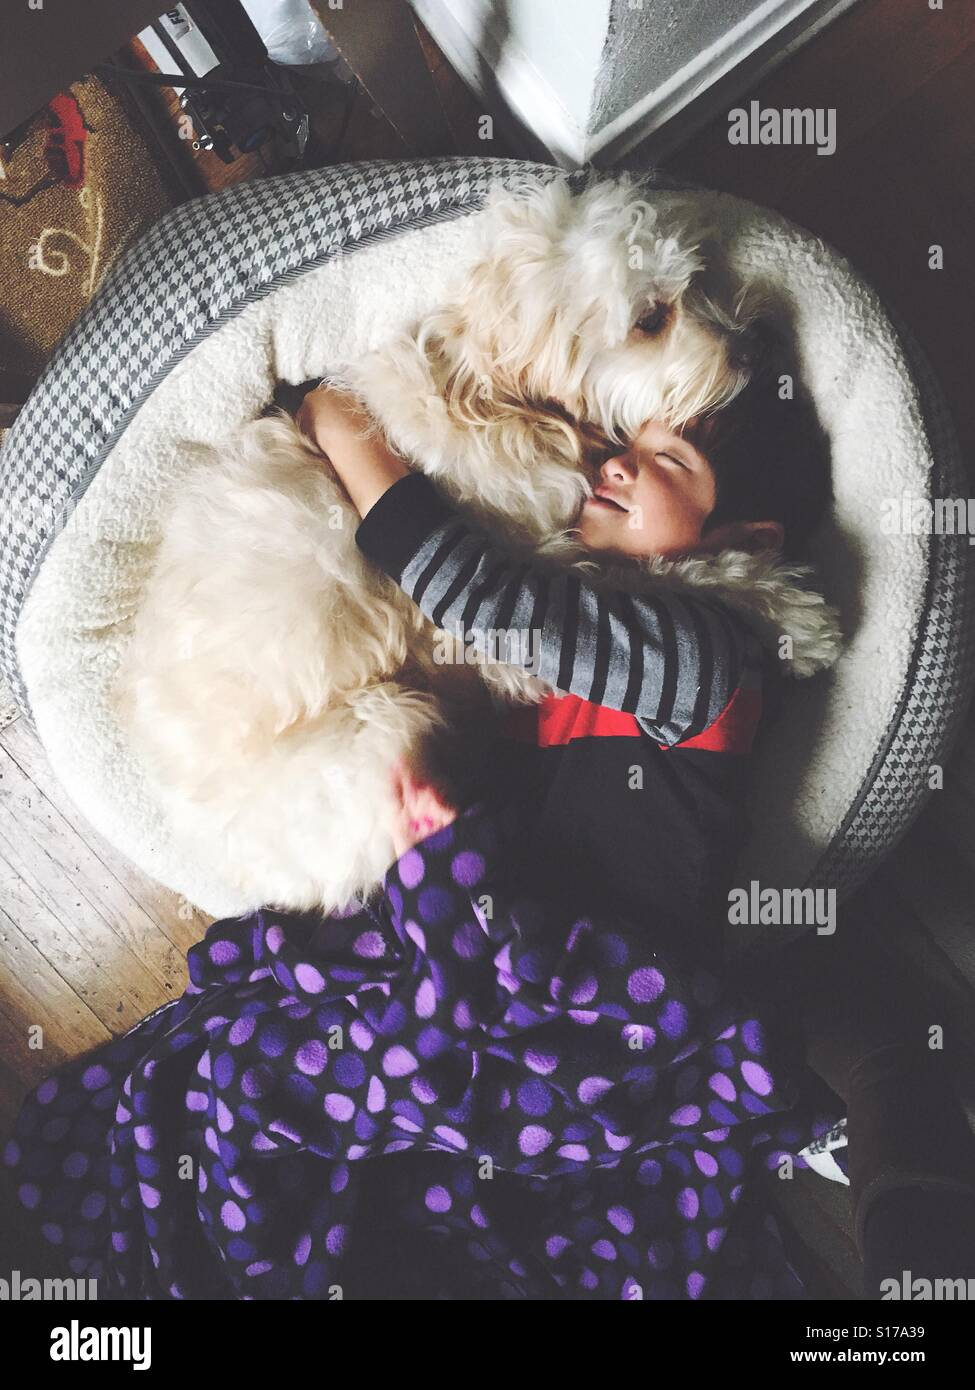 Garçon et meilleur ami snuggle. Photo Stock